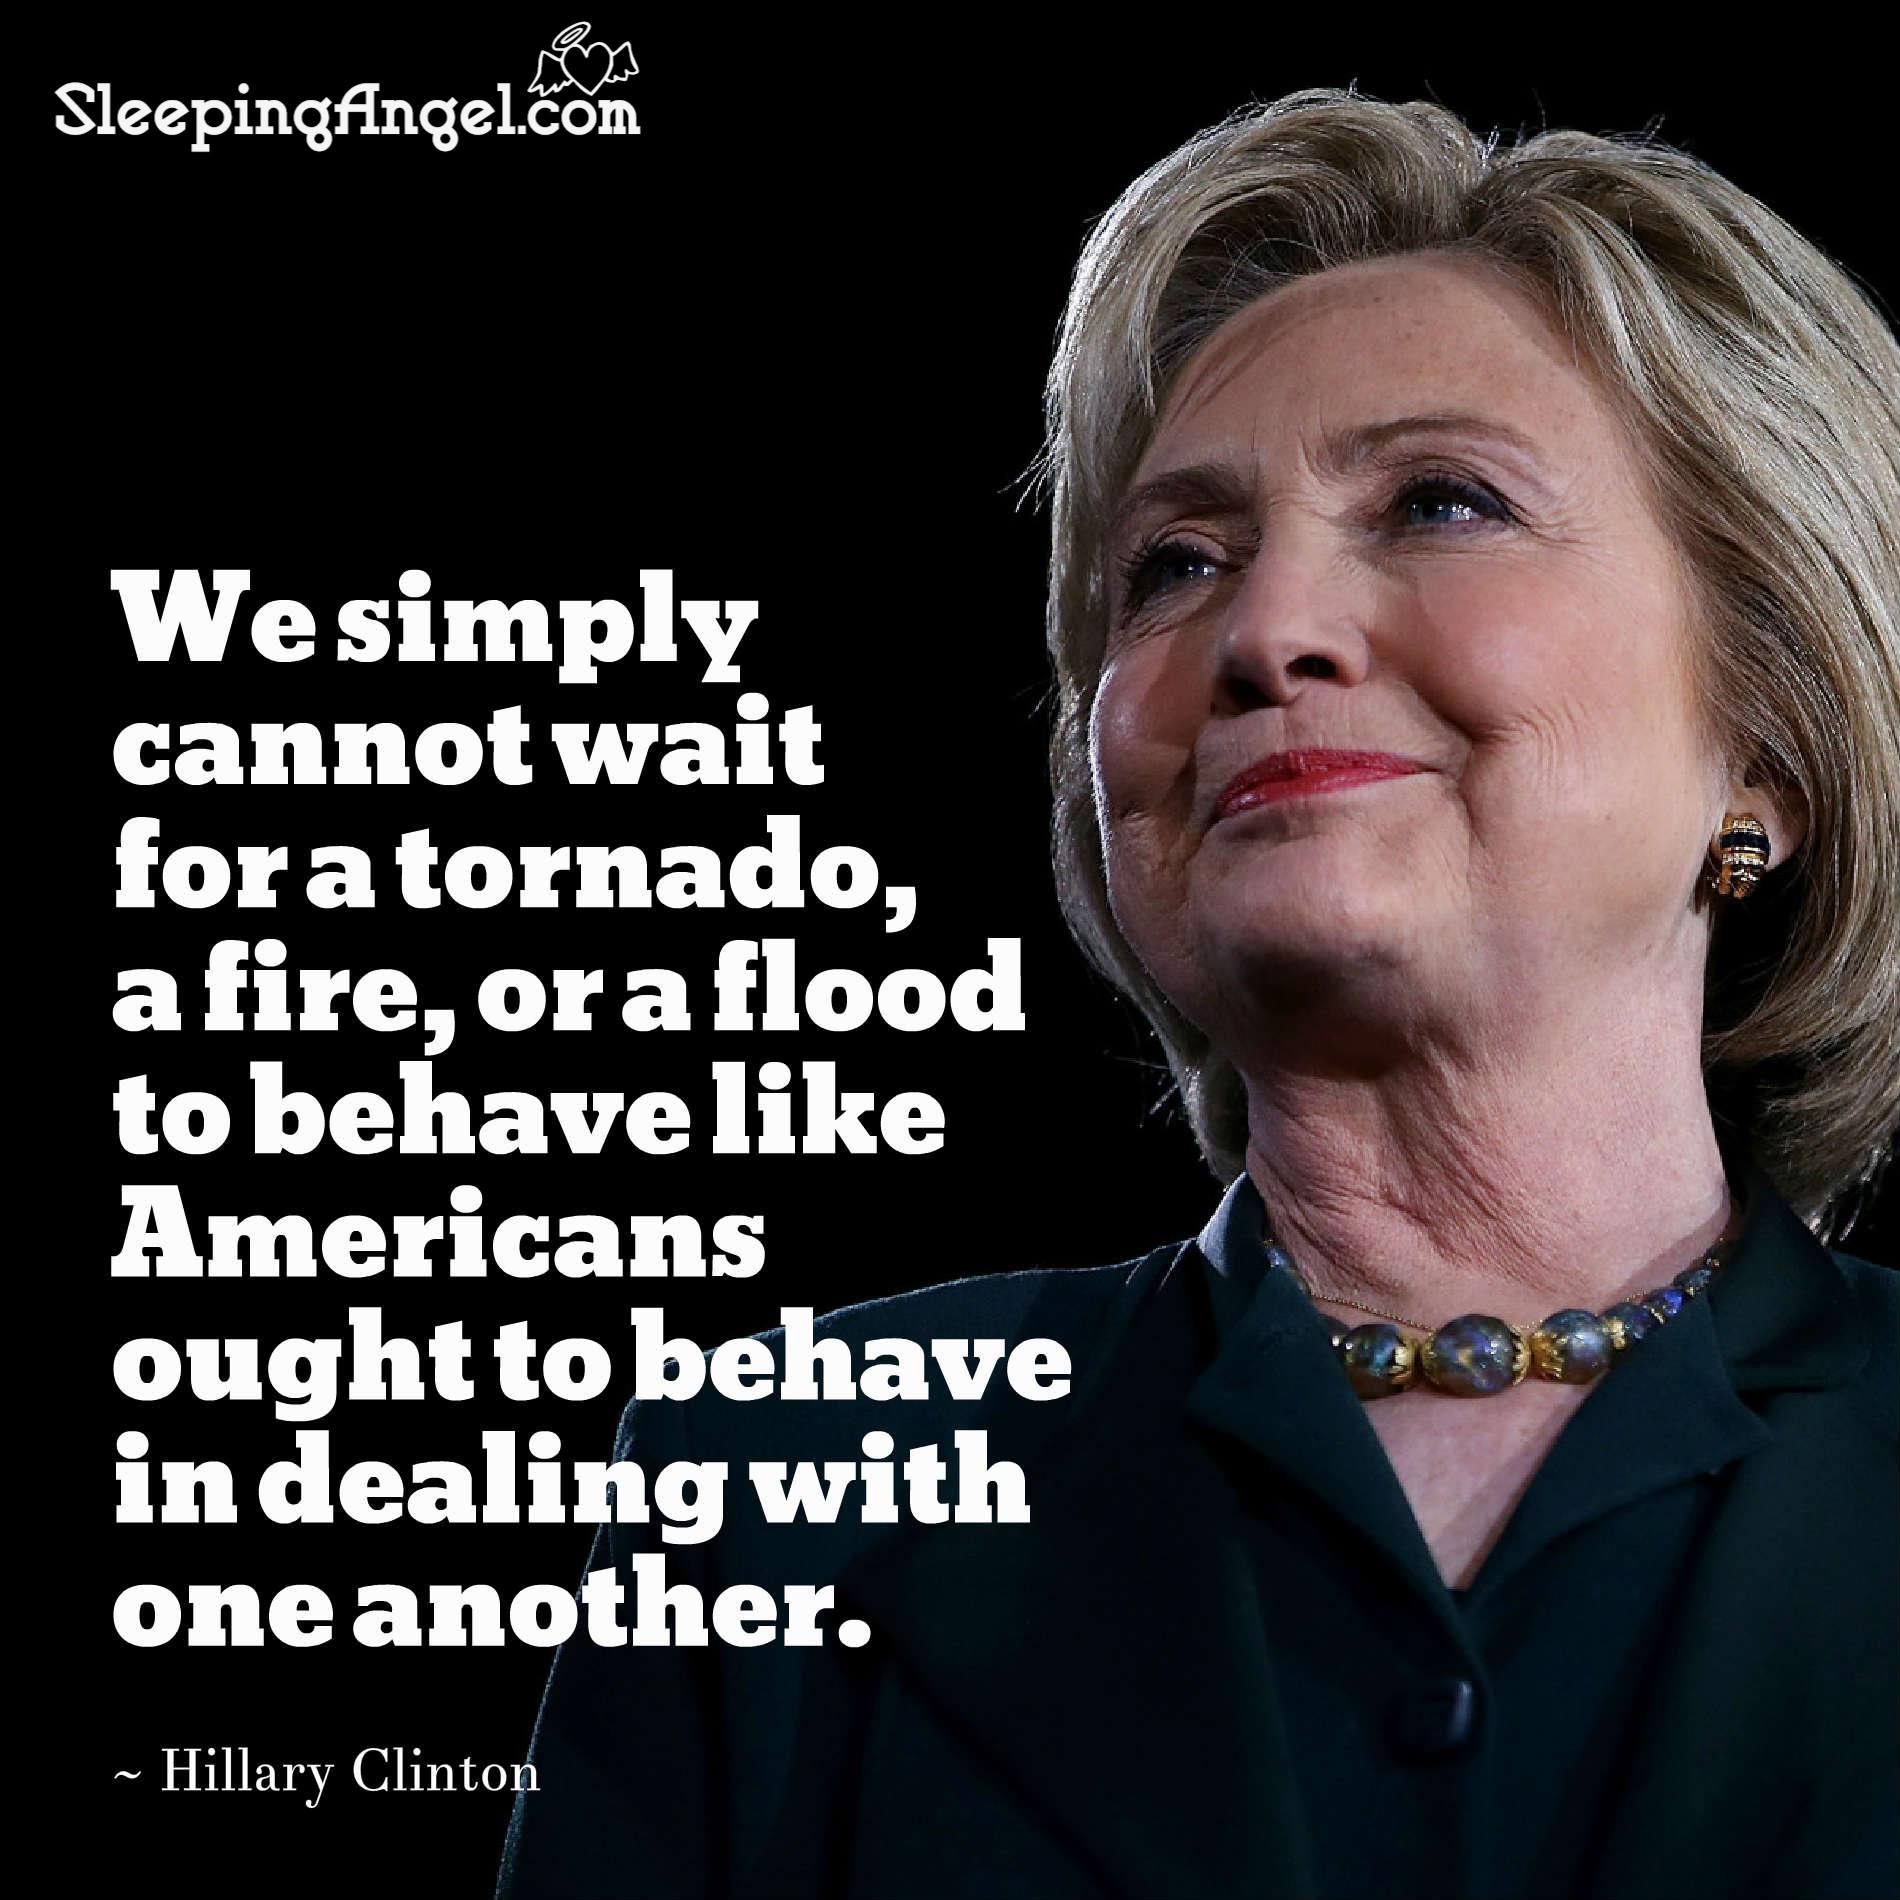 Hillary Clinton Quote Hillary Clinton Quote  Sleeping Angel